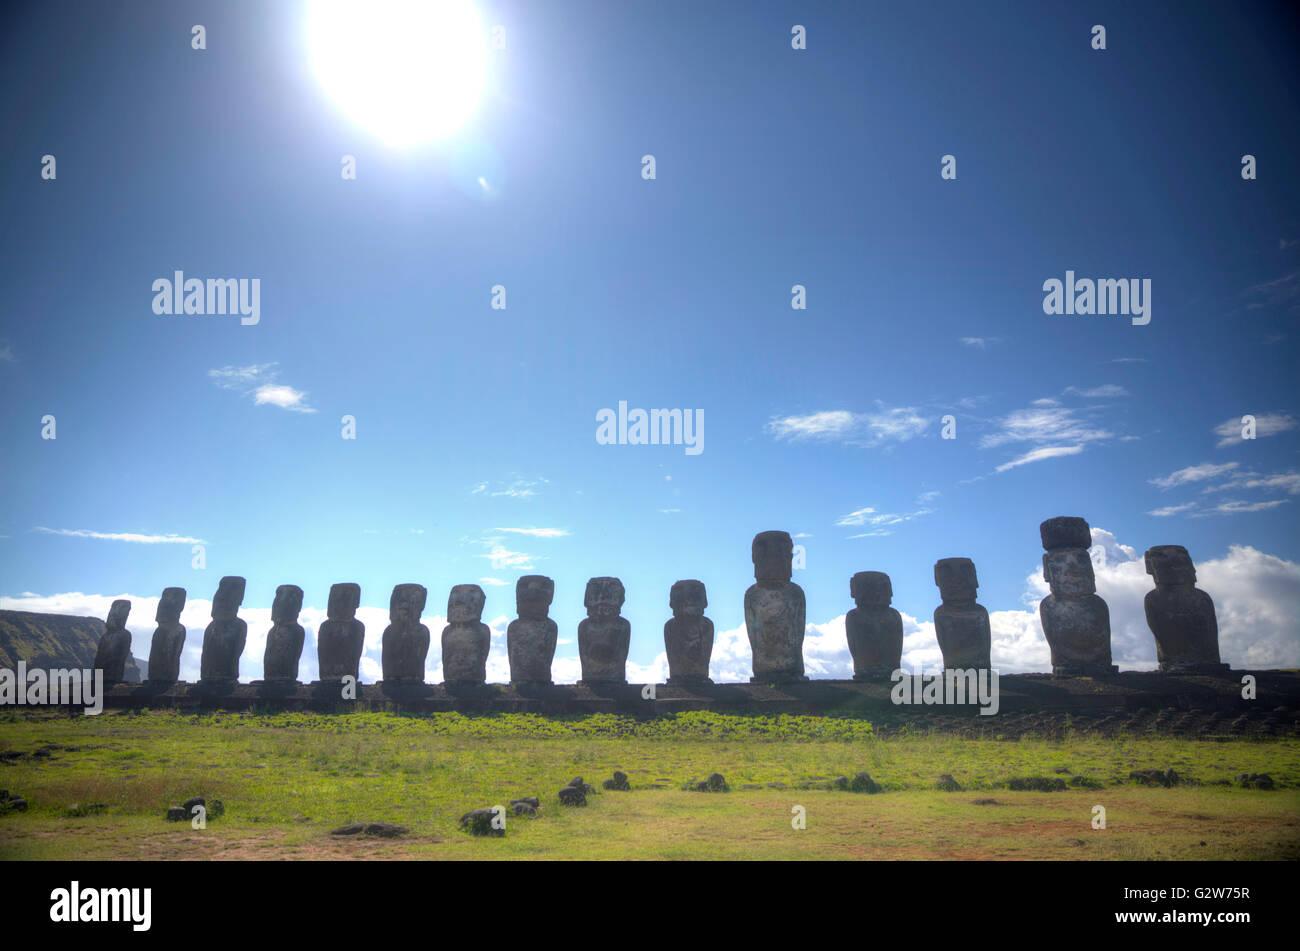 Moais at Ahu Tongariki (Easter island, Chile) - Stock Image